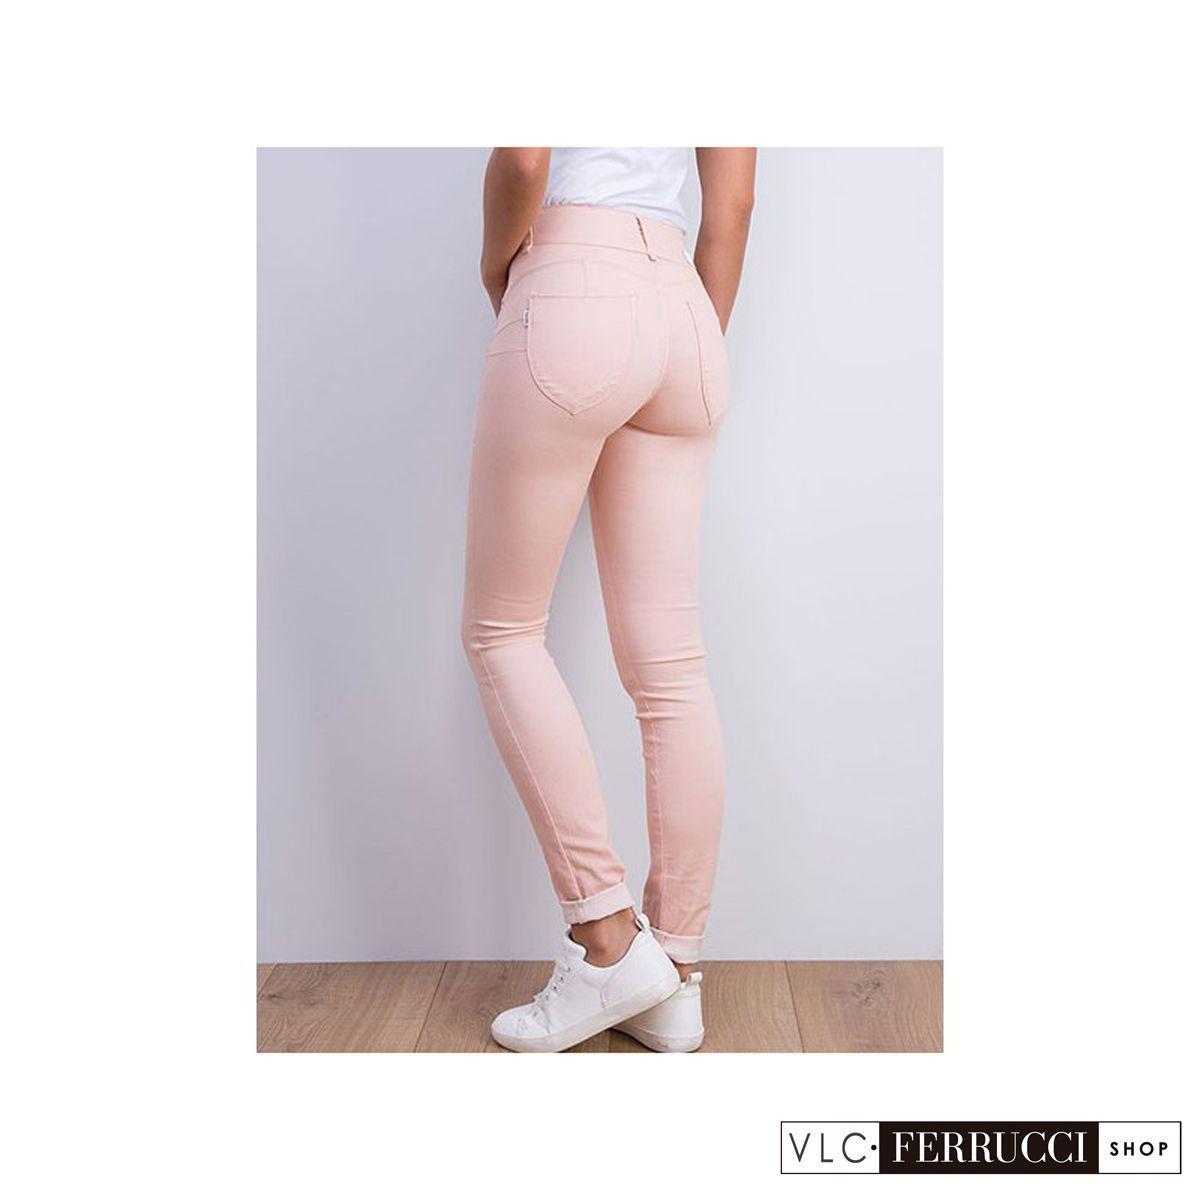 92a9d79101bd Jeans pitillo color rosa palo de talla unica (one size) con efecto ...